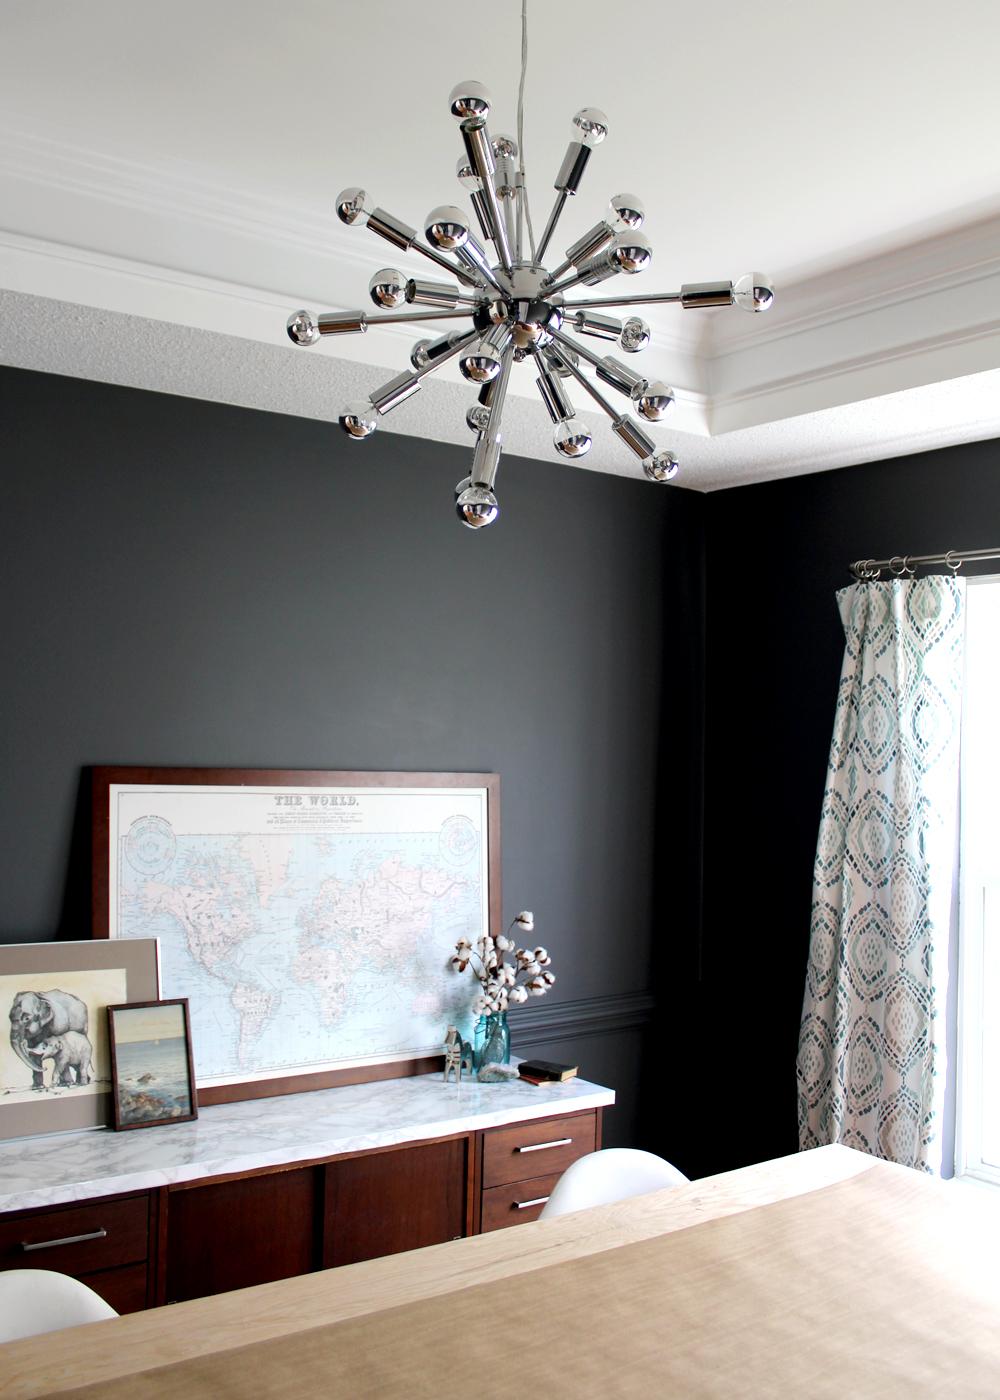 Awesome Dark Grey Dining Room With Modern Sputnik Pendant Light | Tagu0026tibby